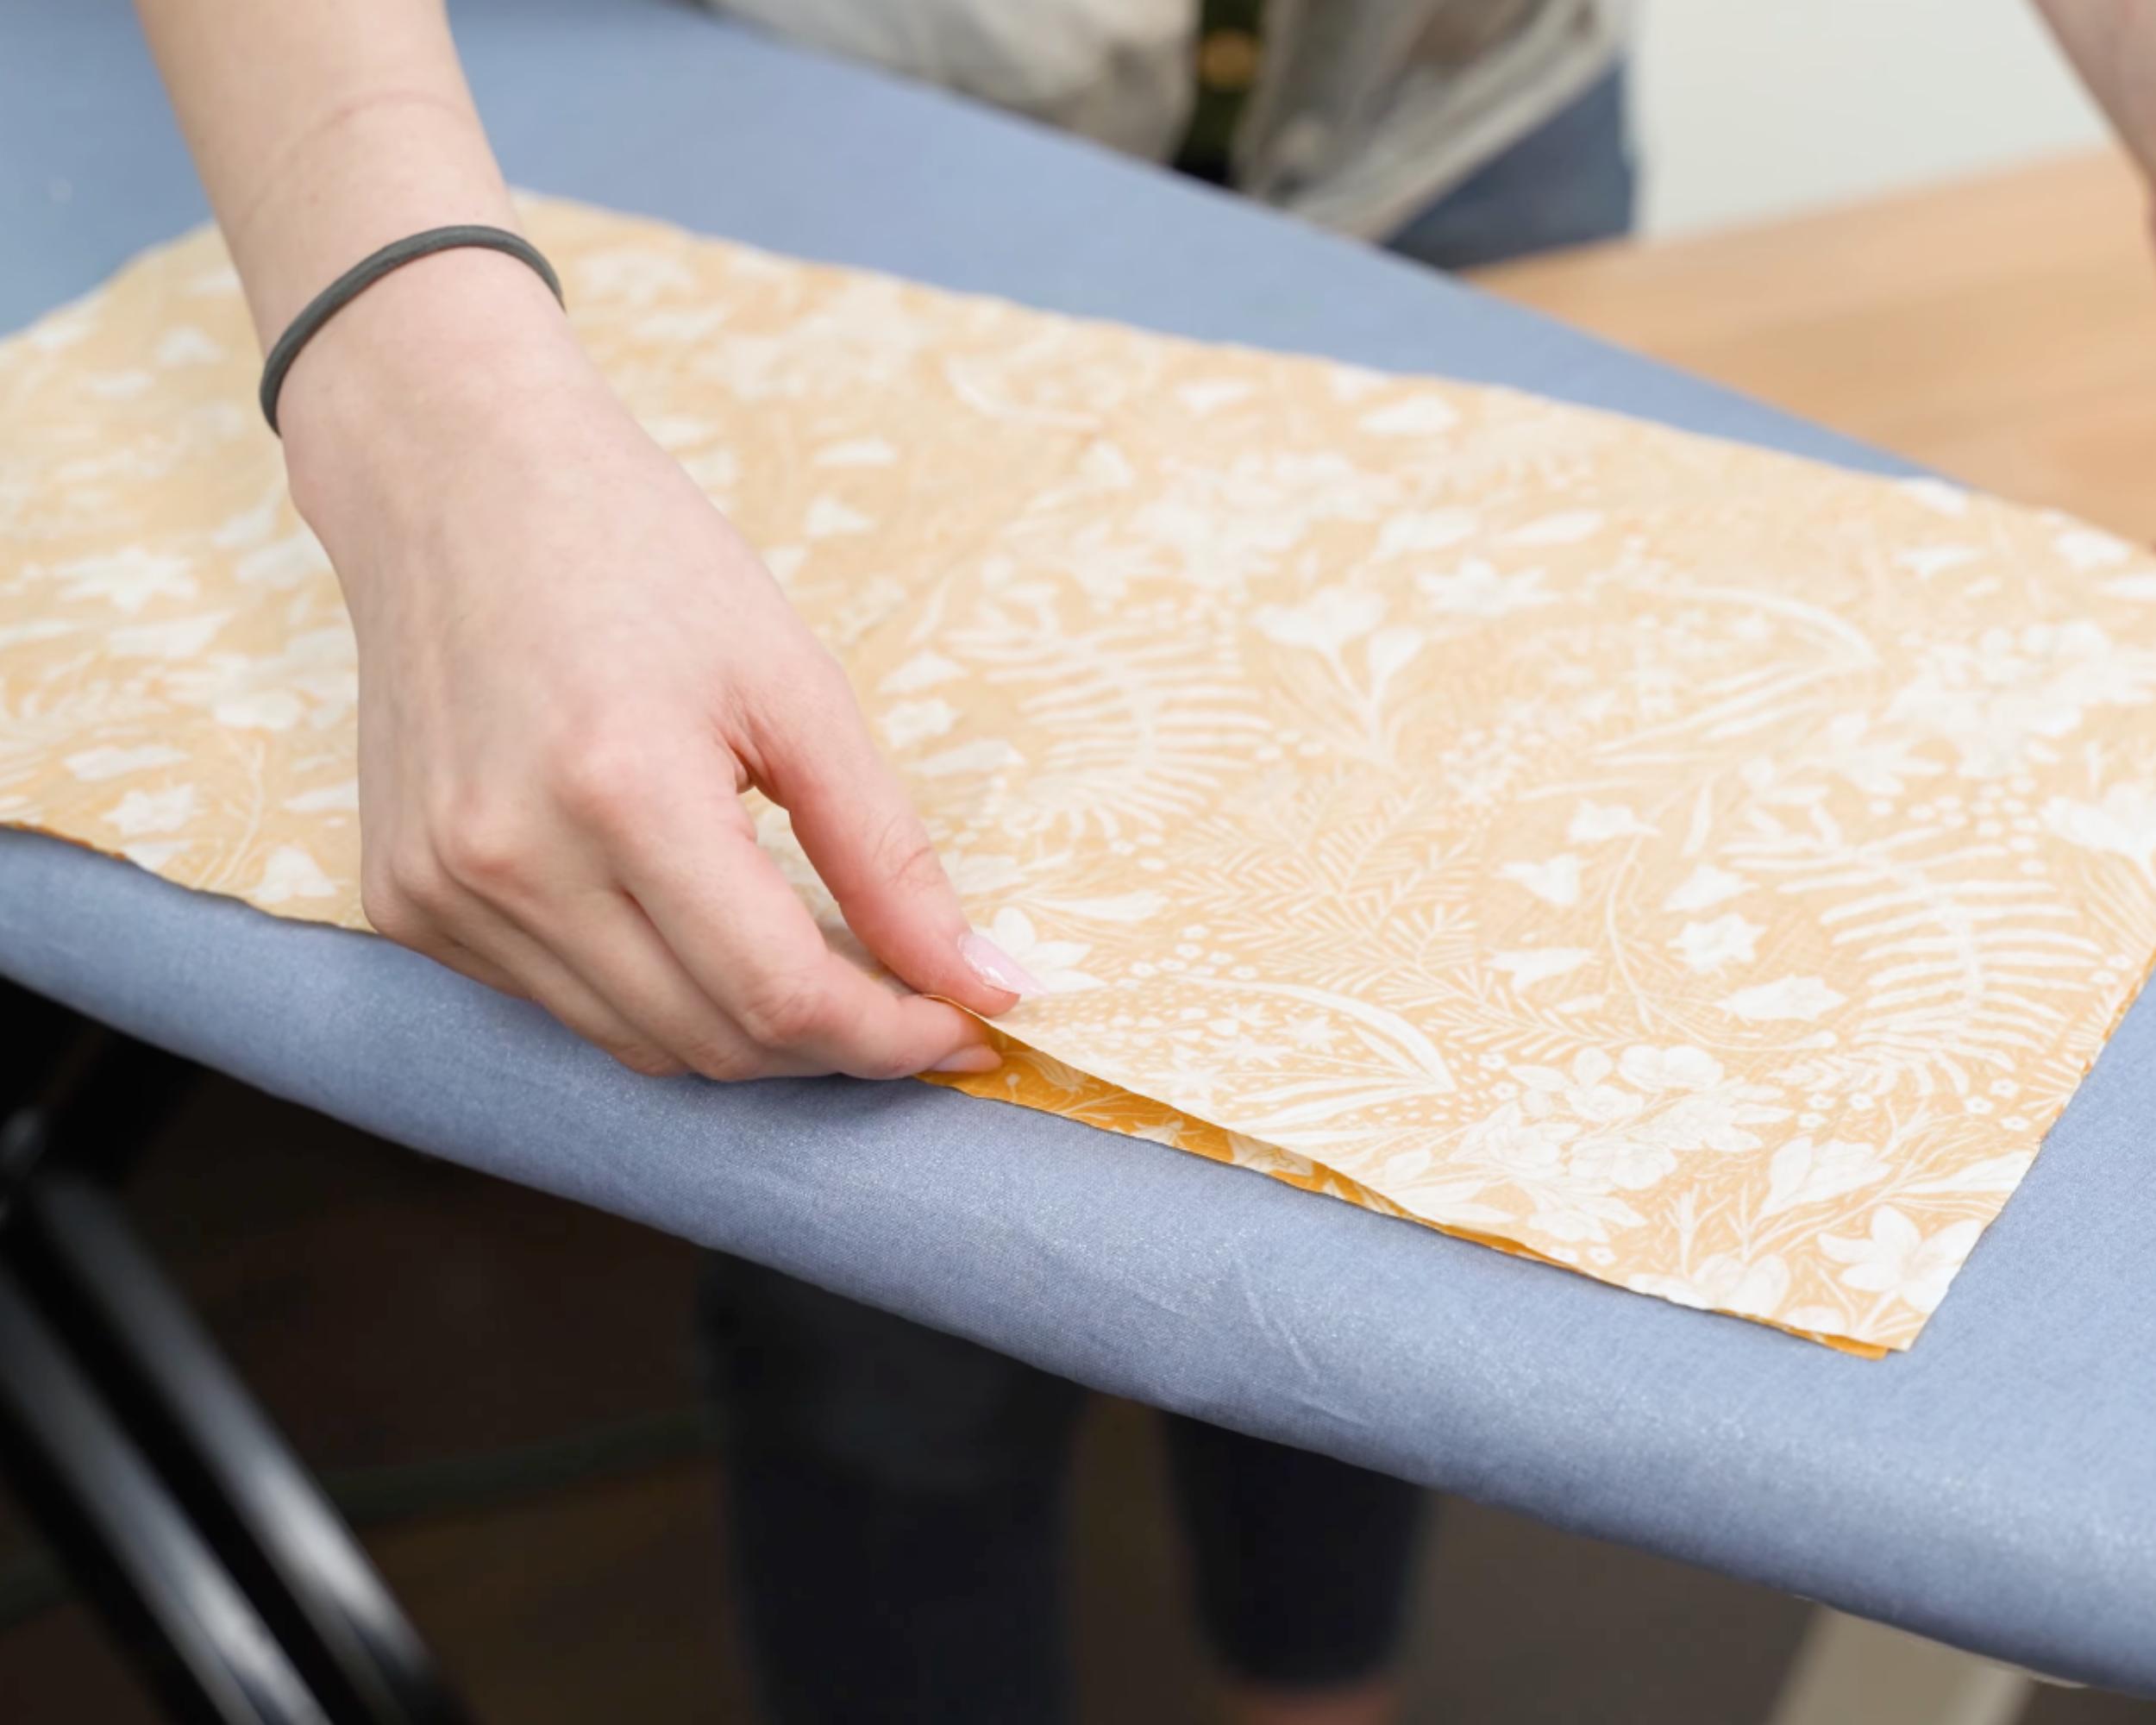 Placing skirt panels together